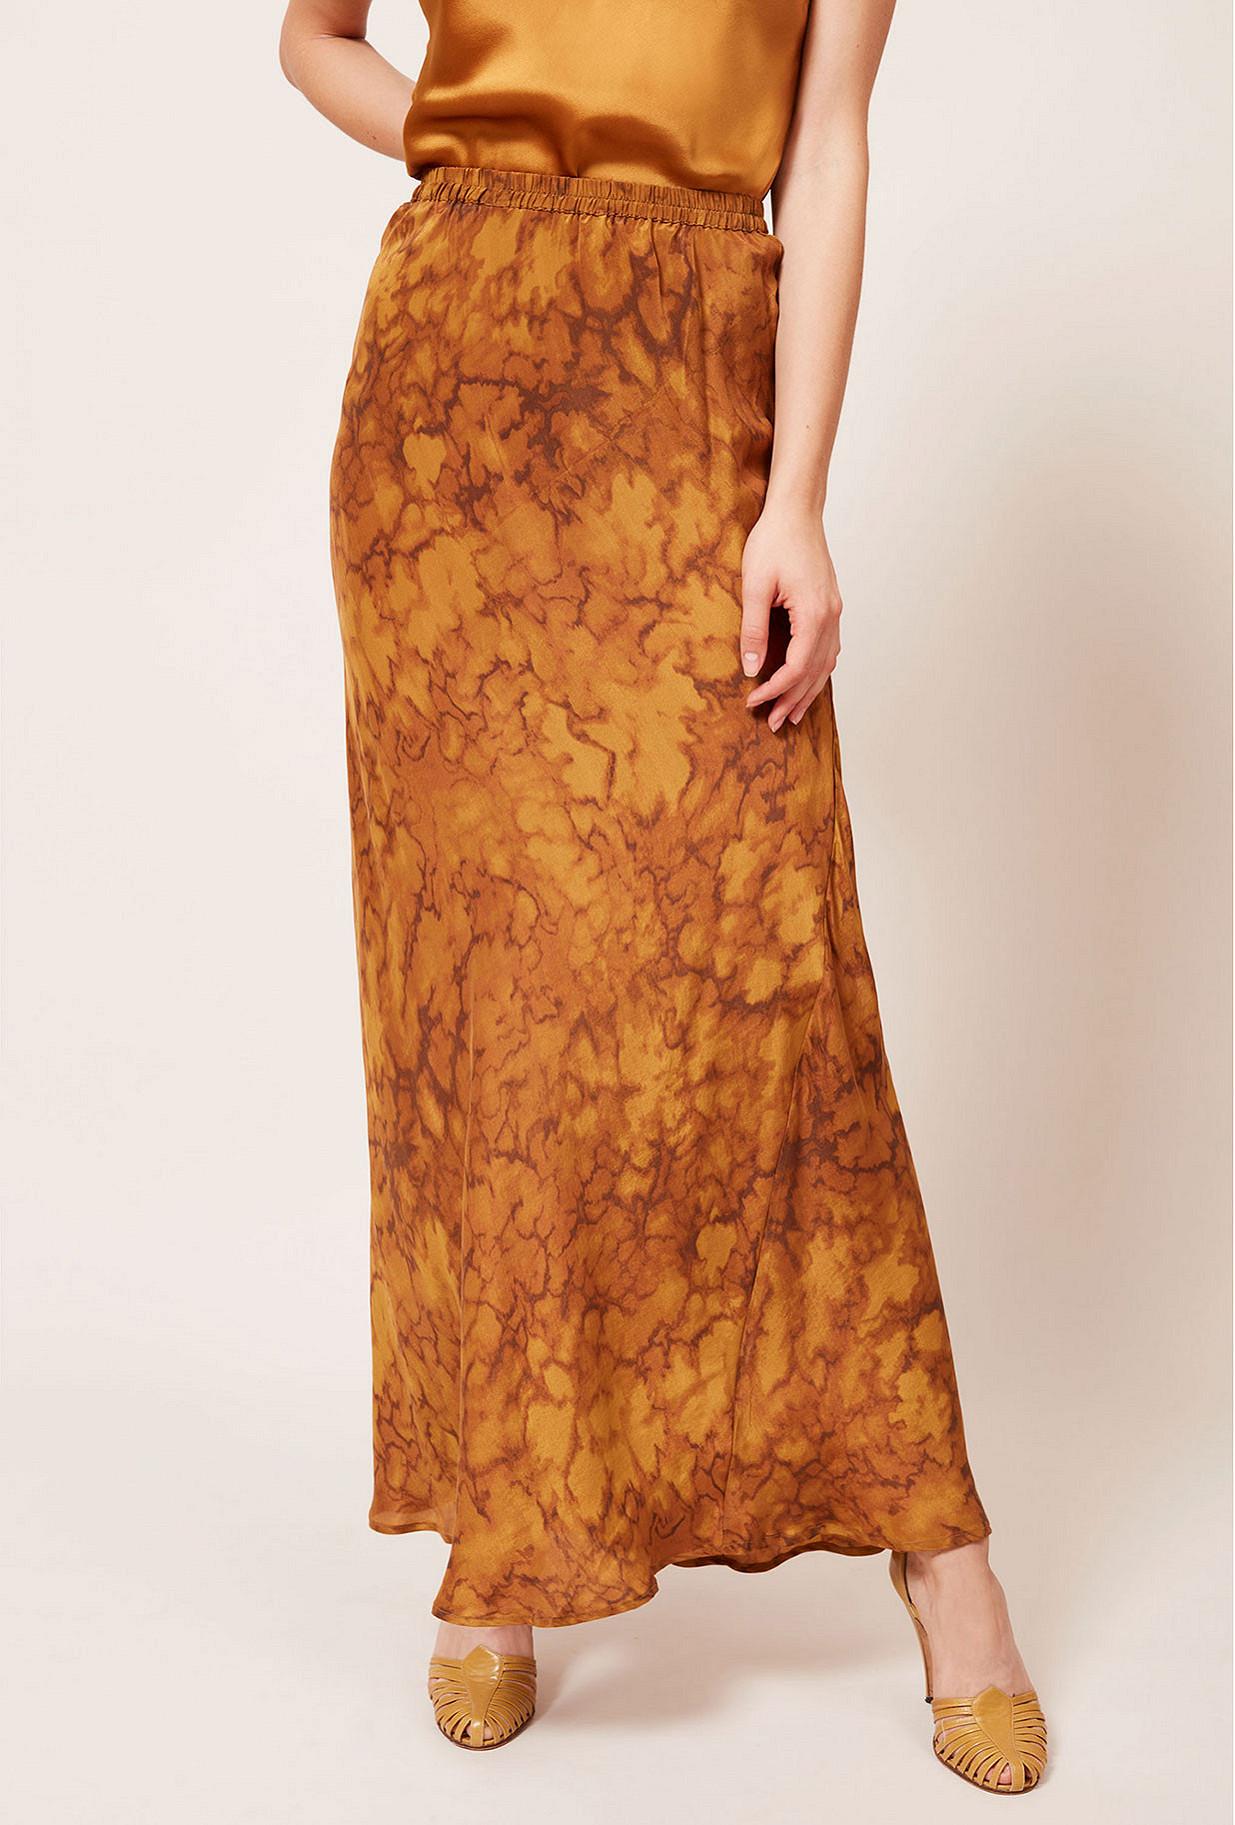 Paris clothes store Skirt  Matadore french designer fashion Paris